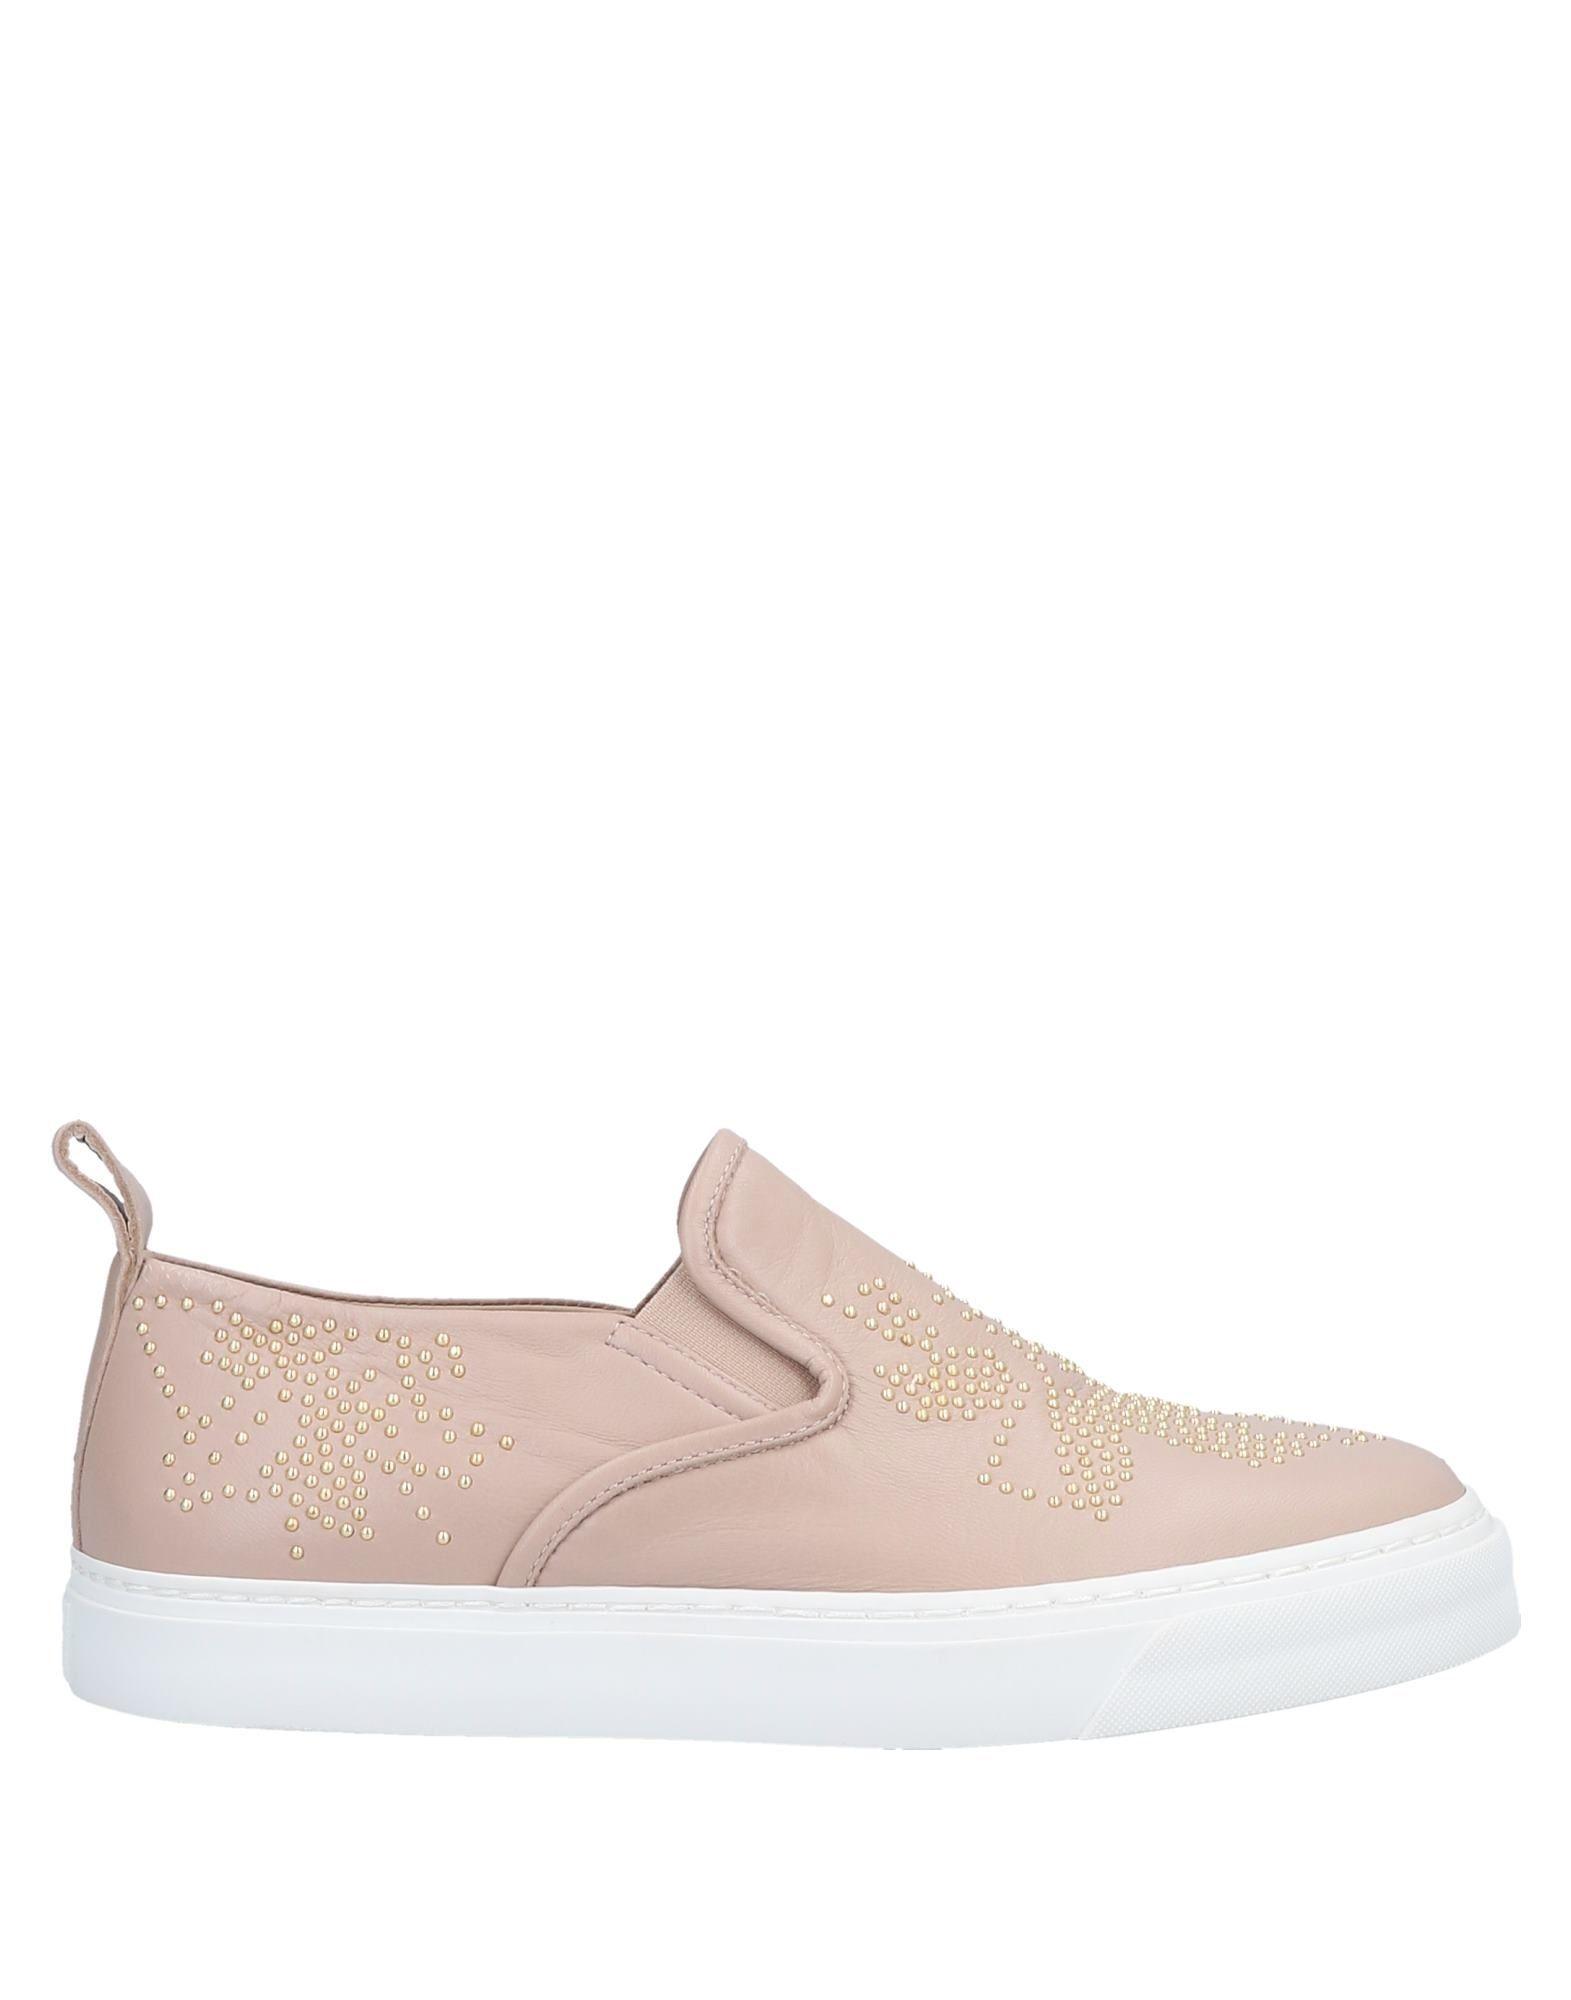 Chloé Loafers - on Women Chloé Loafers online on -  Australia - 11235786AF 9fb3f4